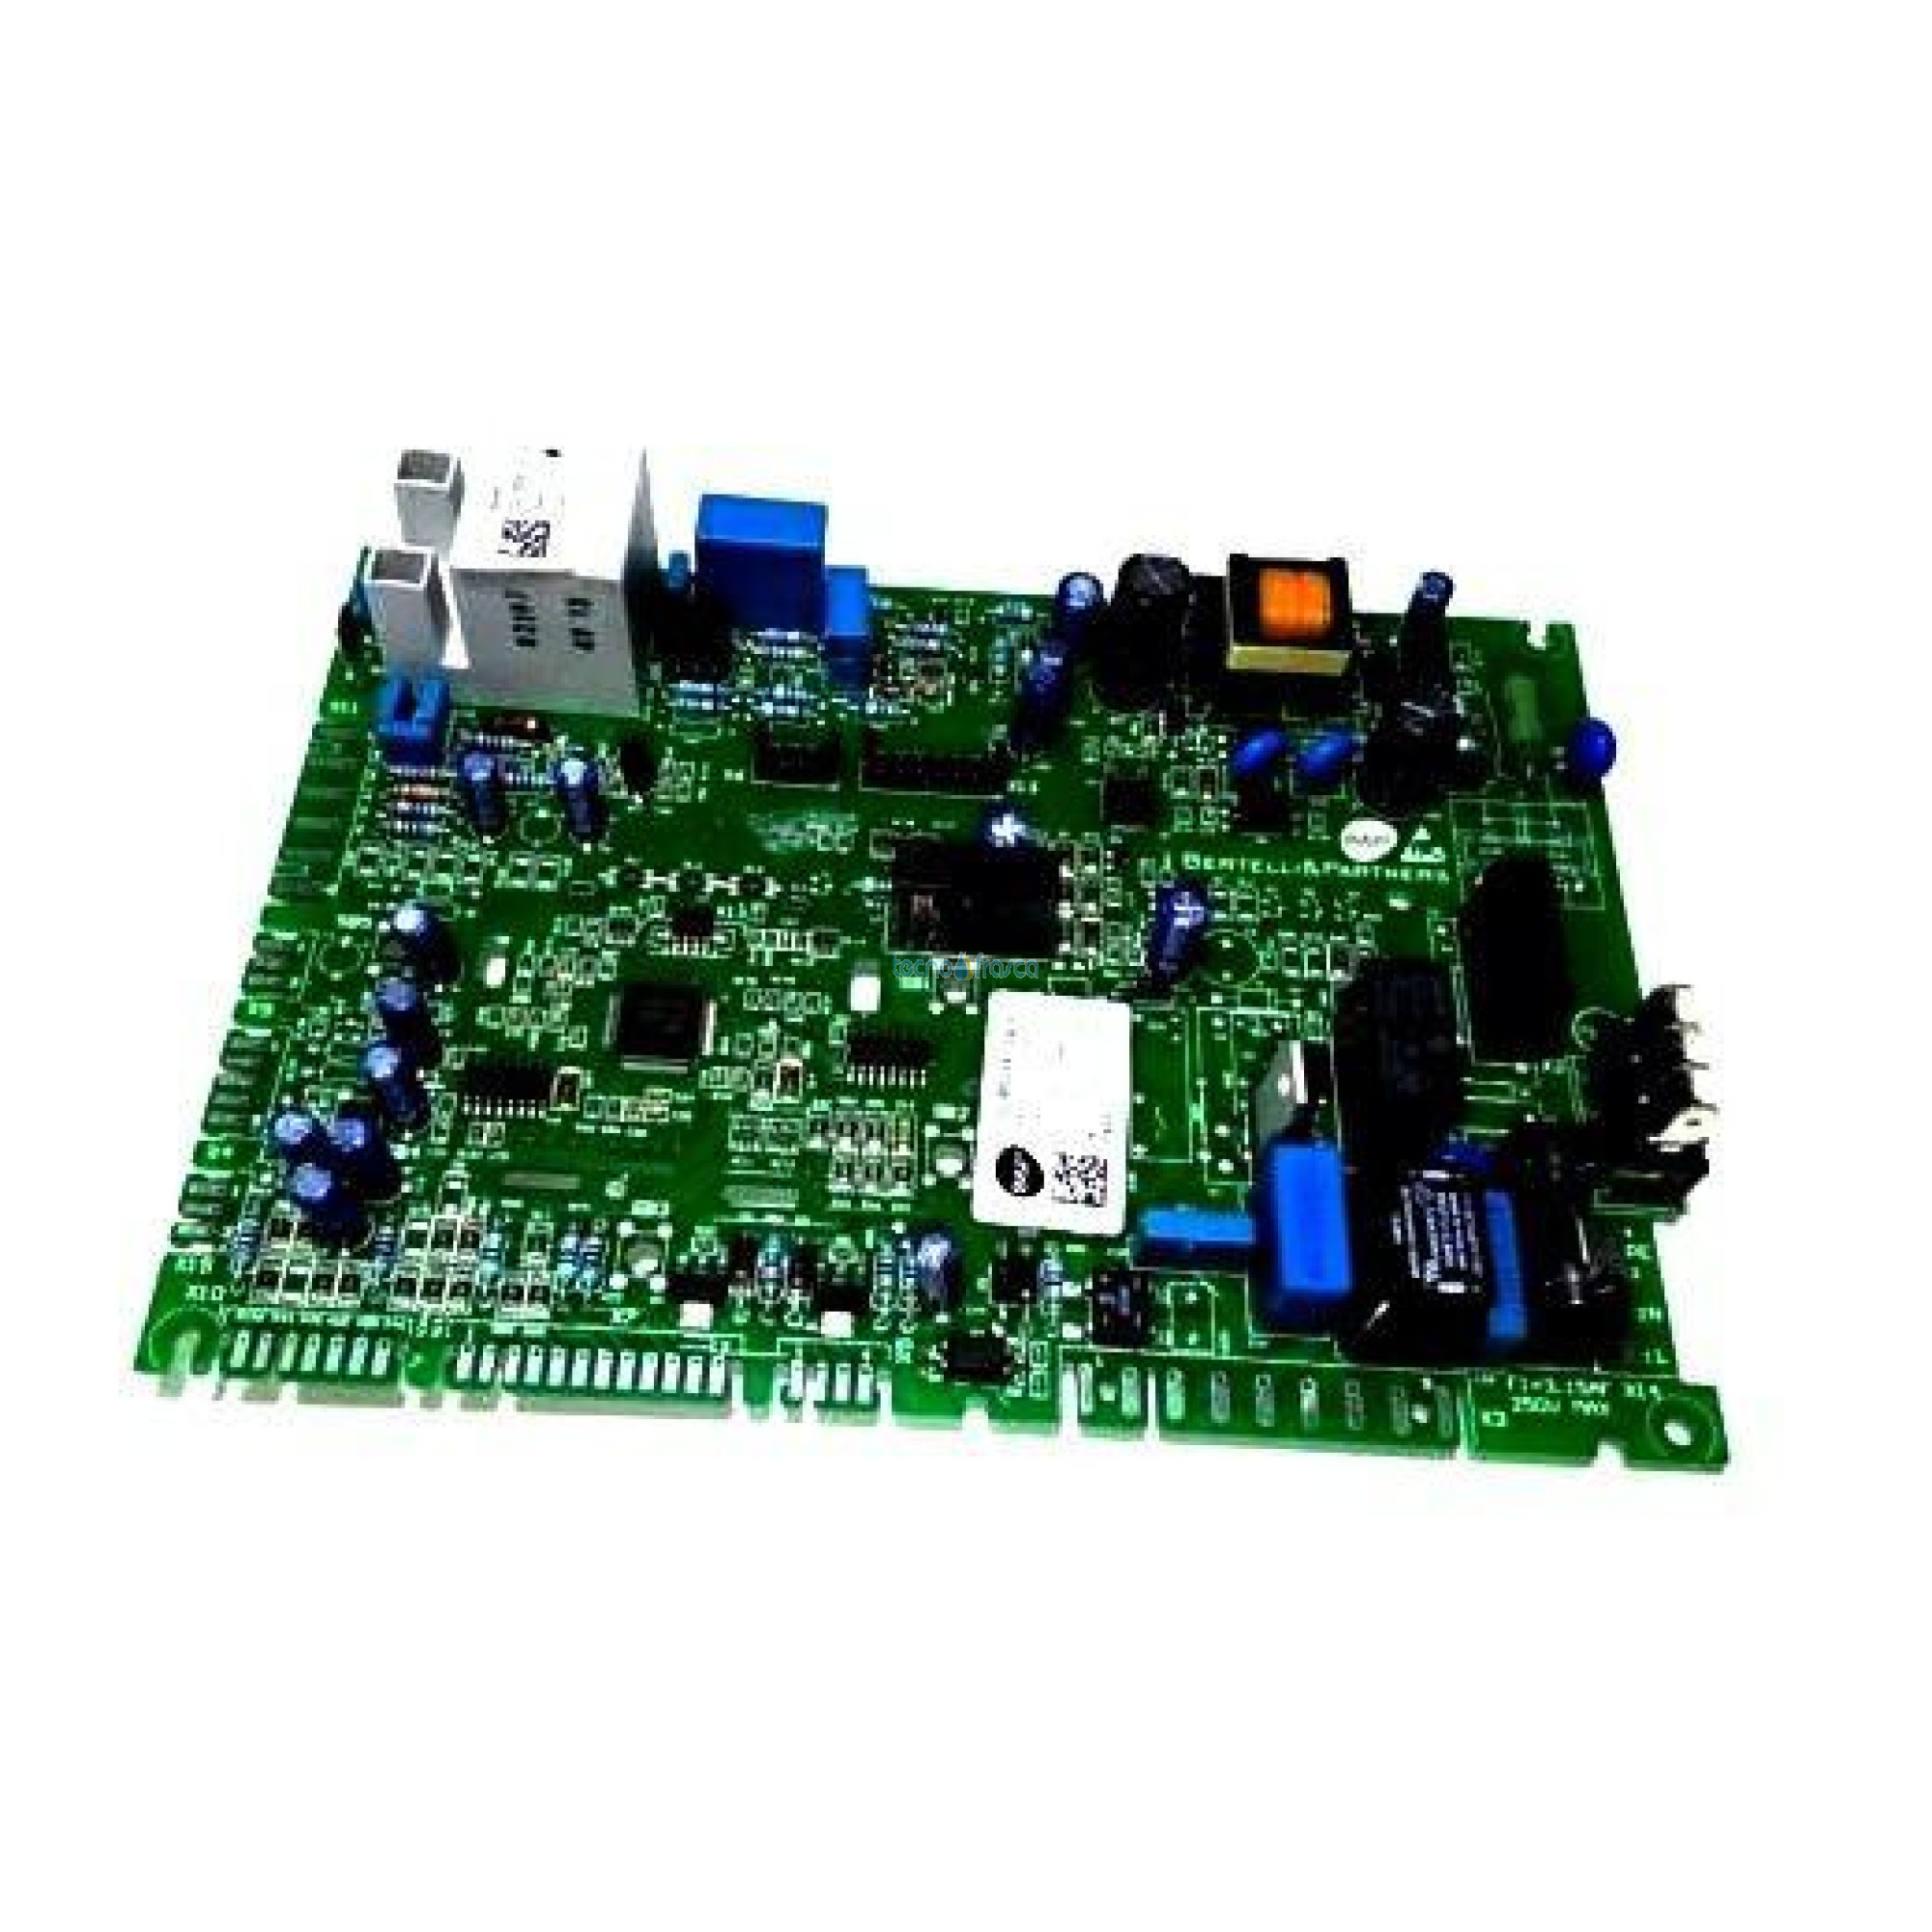 Savio biasi scheda integrata b&p m297 bi2225109